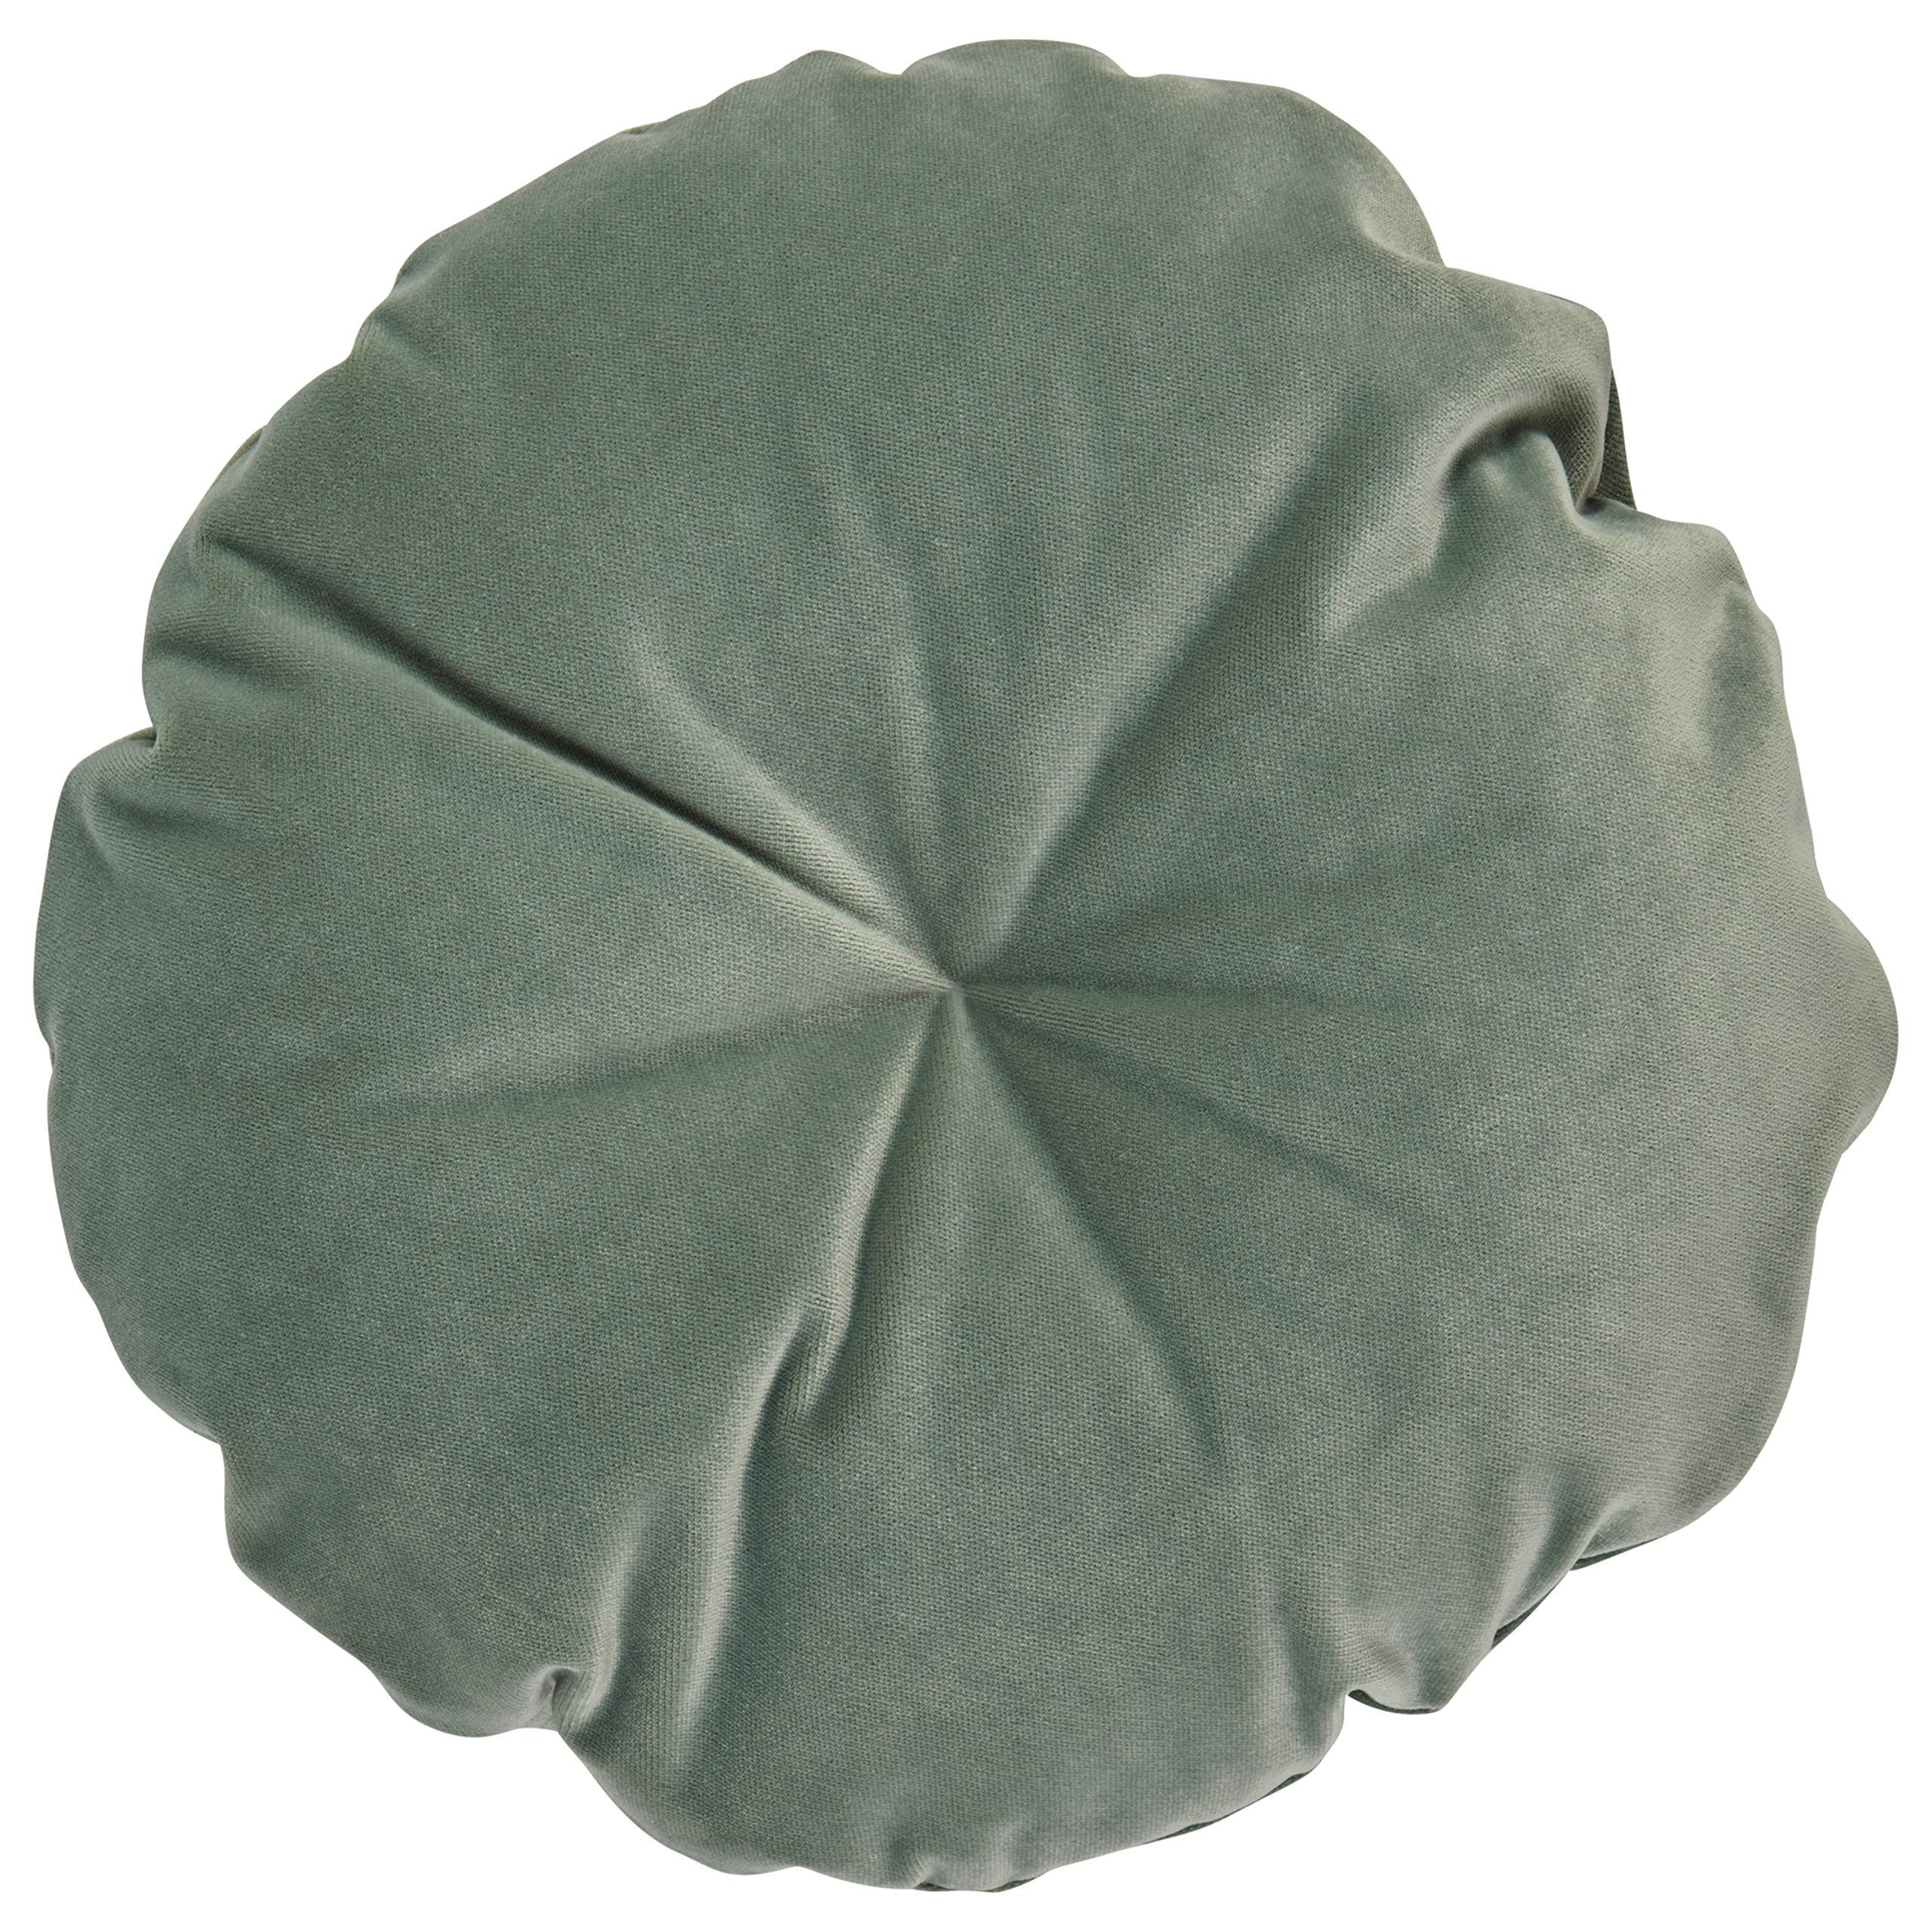 Rivet Mid-Century Round Velvet Throw Pillow - 16 x 16 Inch, Aqua by Rivet